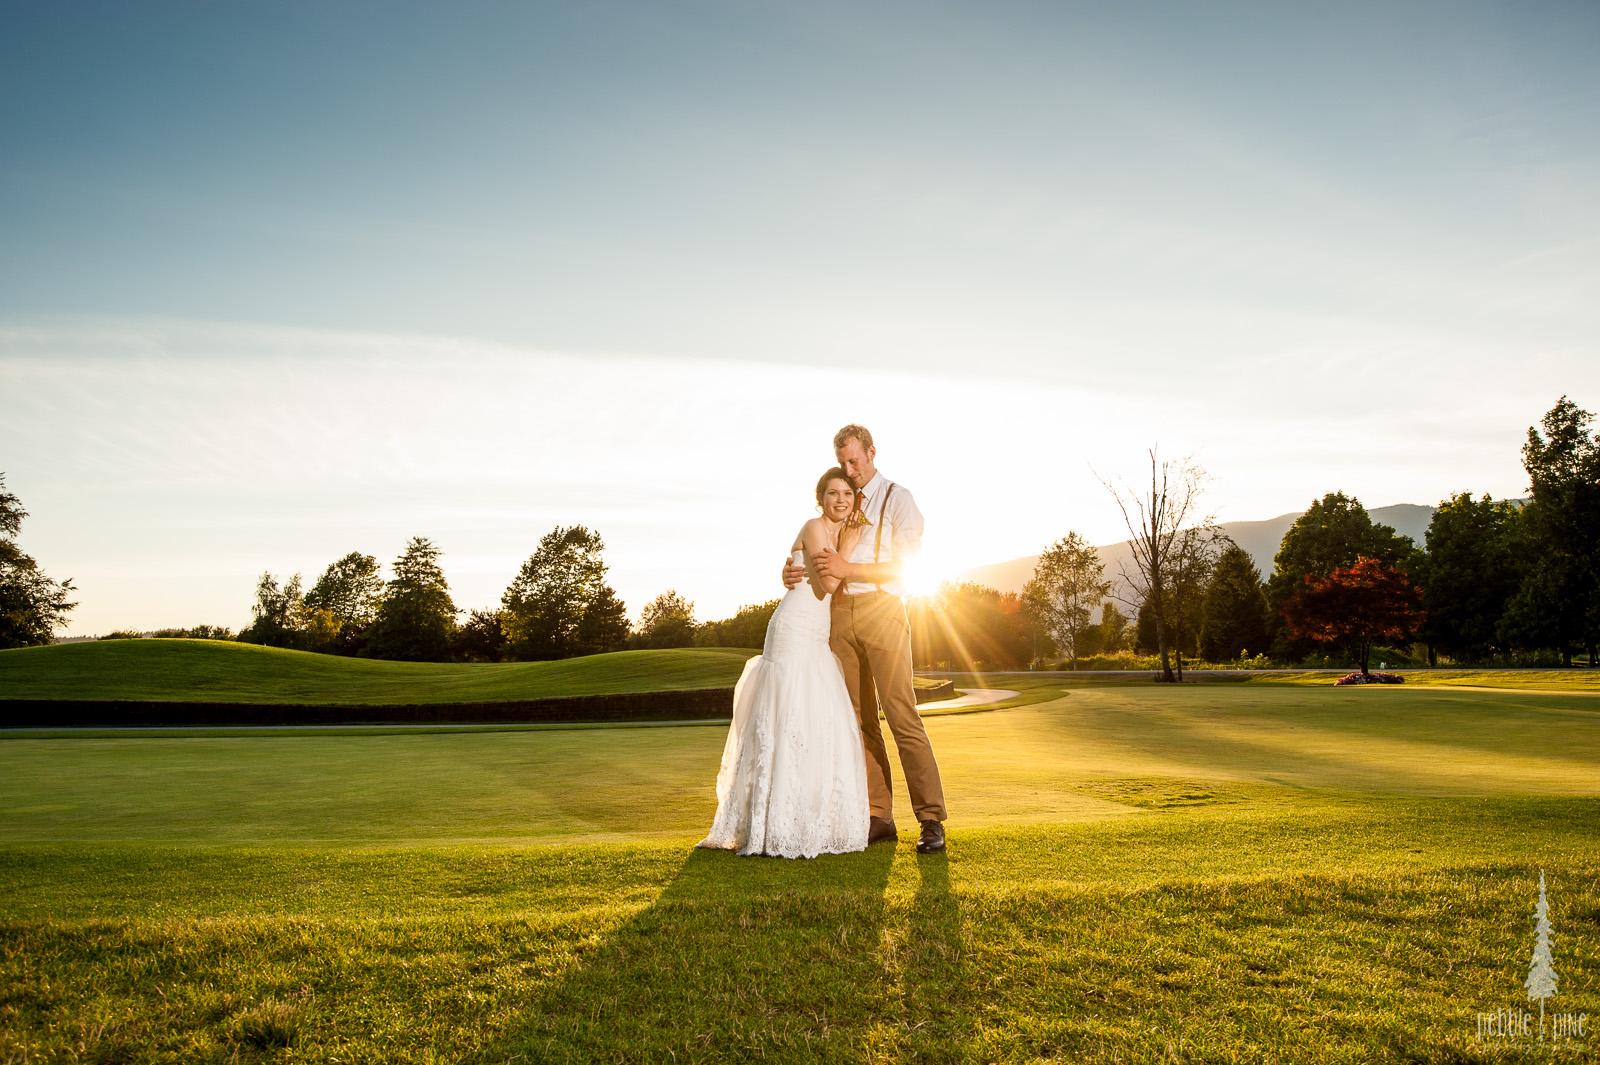 vancouver-island-wedding-photographers-golden-eagle-golf-course-wedding-mountaintop-wedding-62.jpg